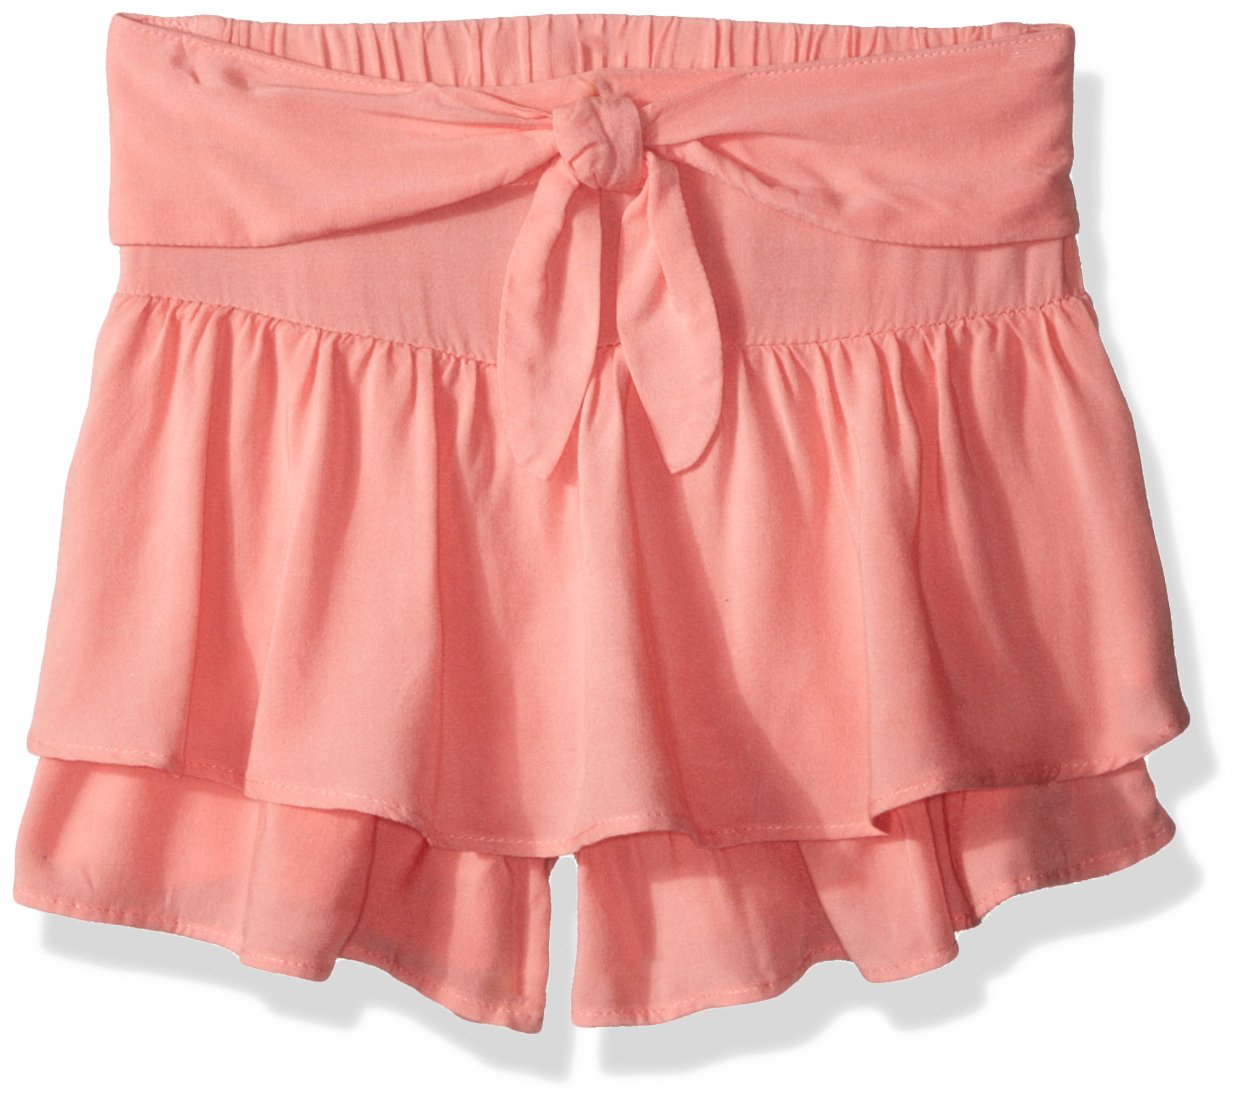 Crazy 8 Girls' Toddler Tie Front Skort, Pink, 2T